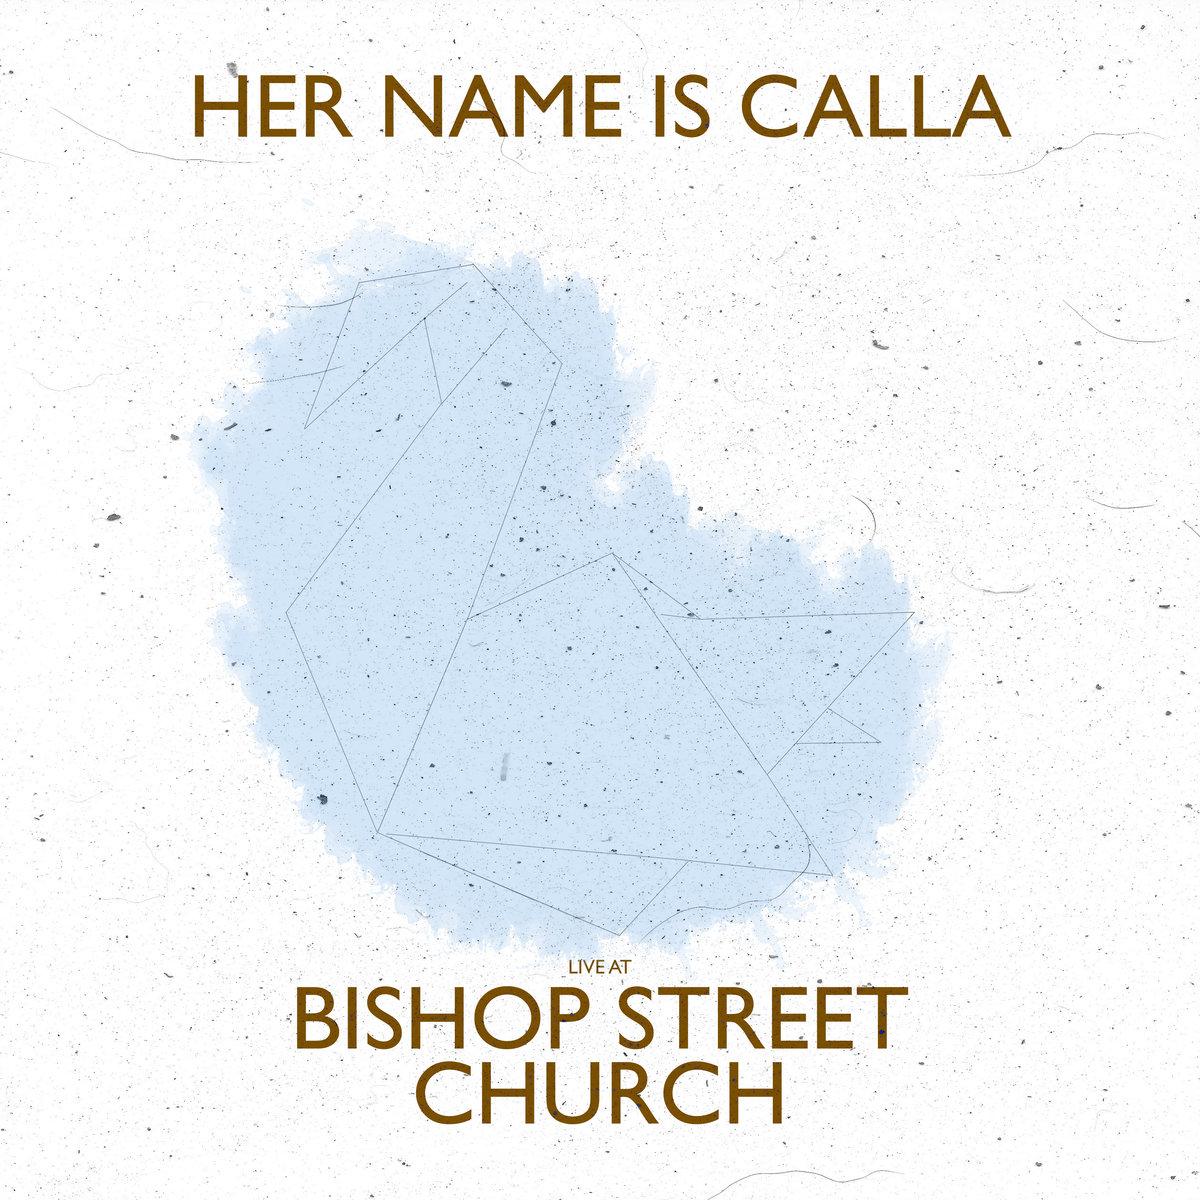 Live at Bishop Street Church